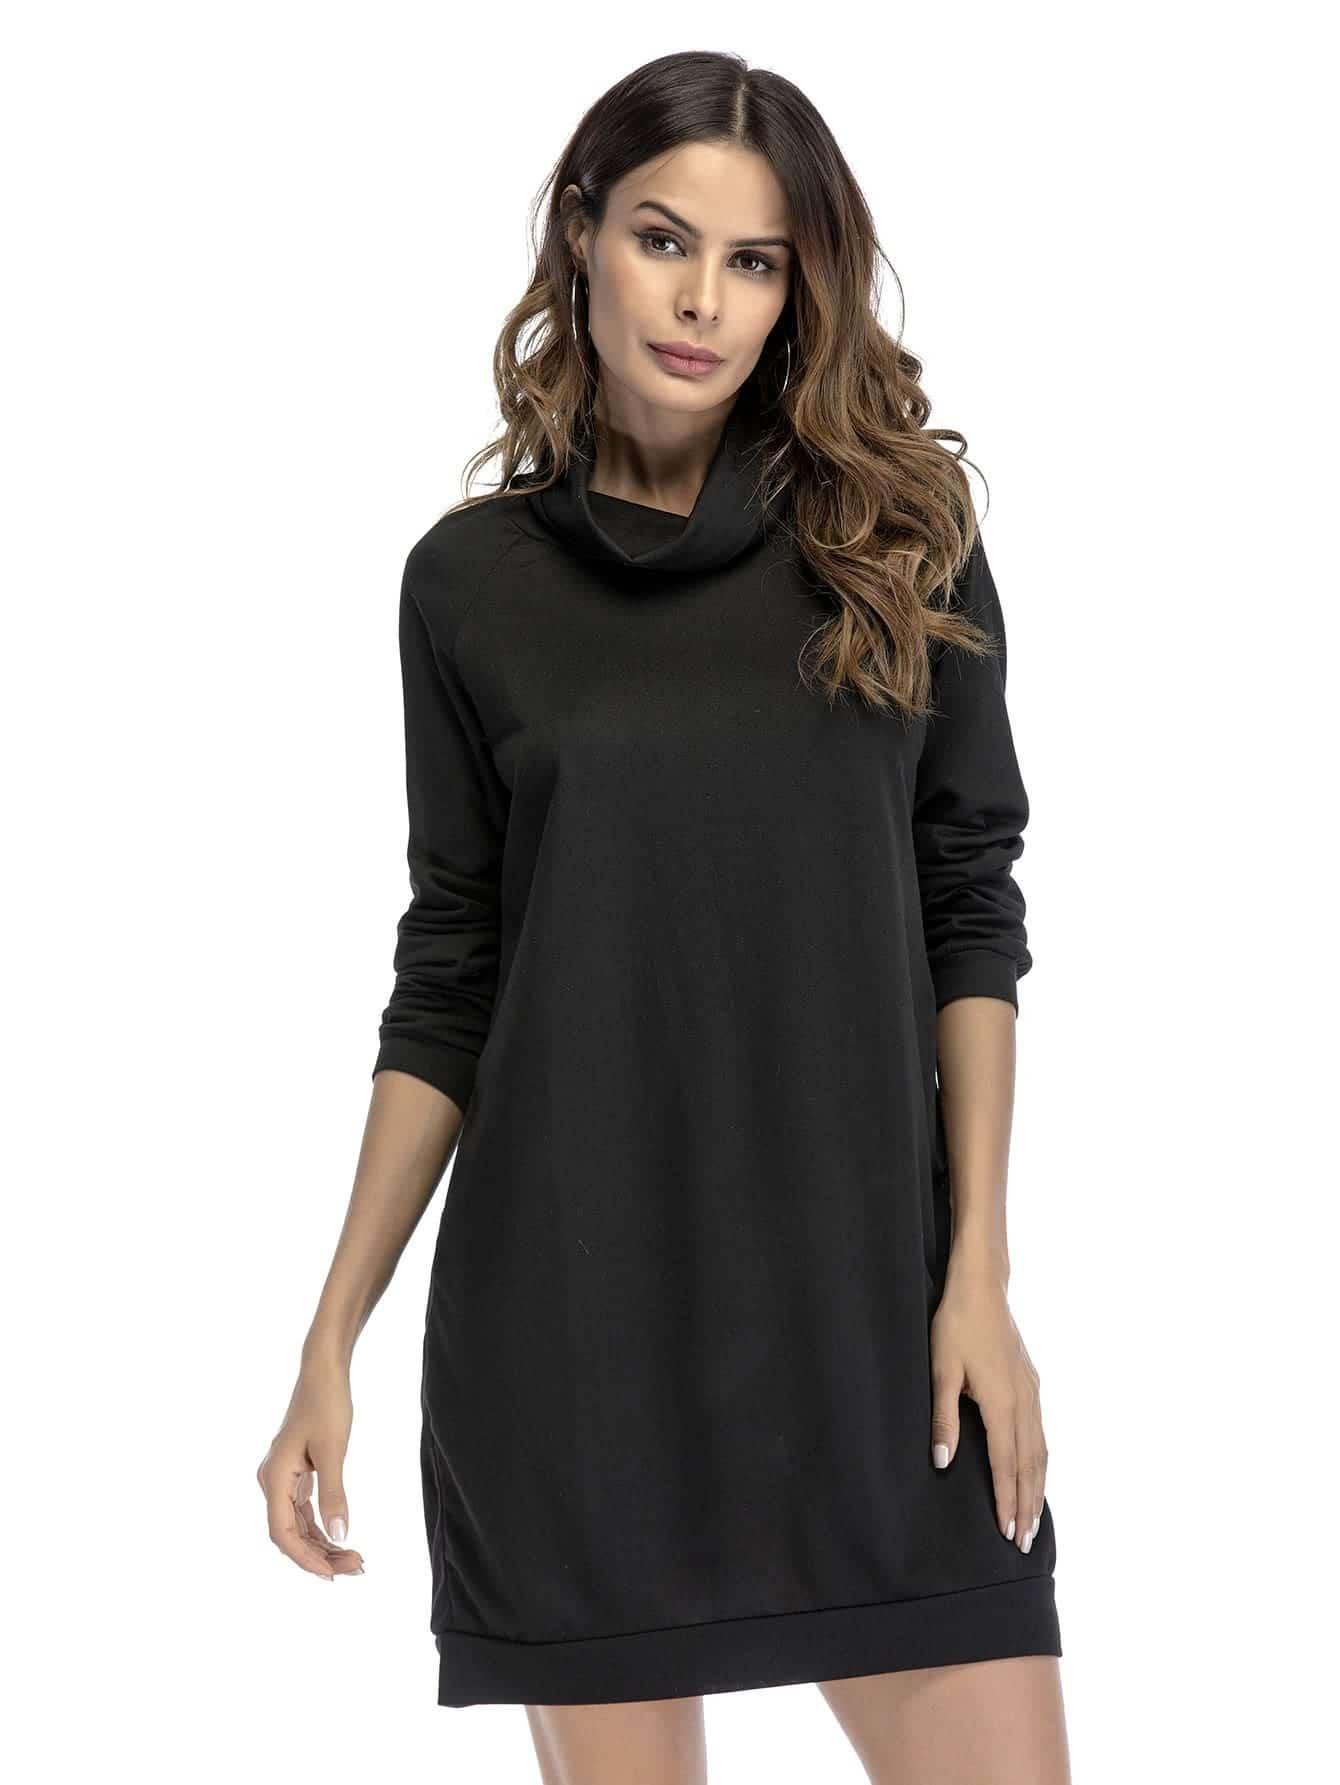 Cowl Neck Raglan Sweatshirt Dress dress171206106